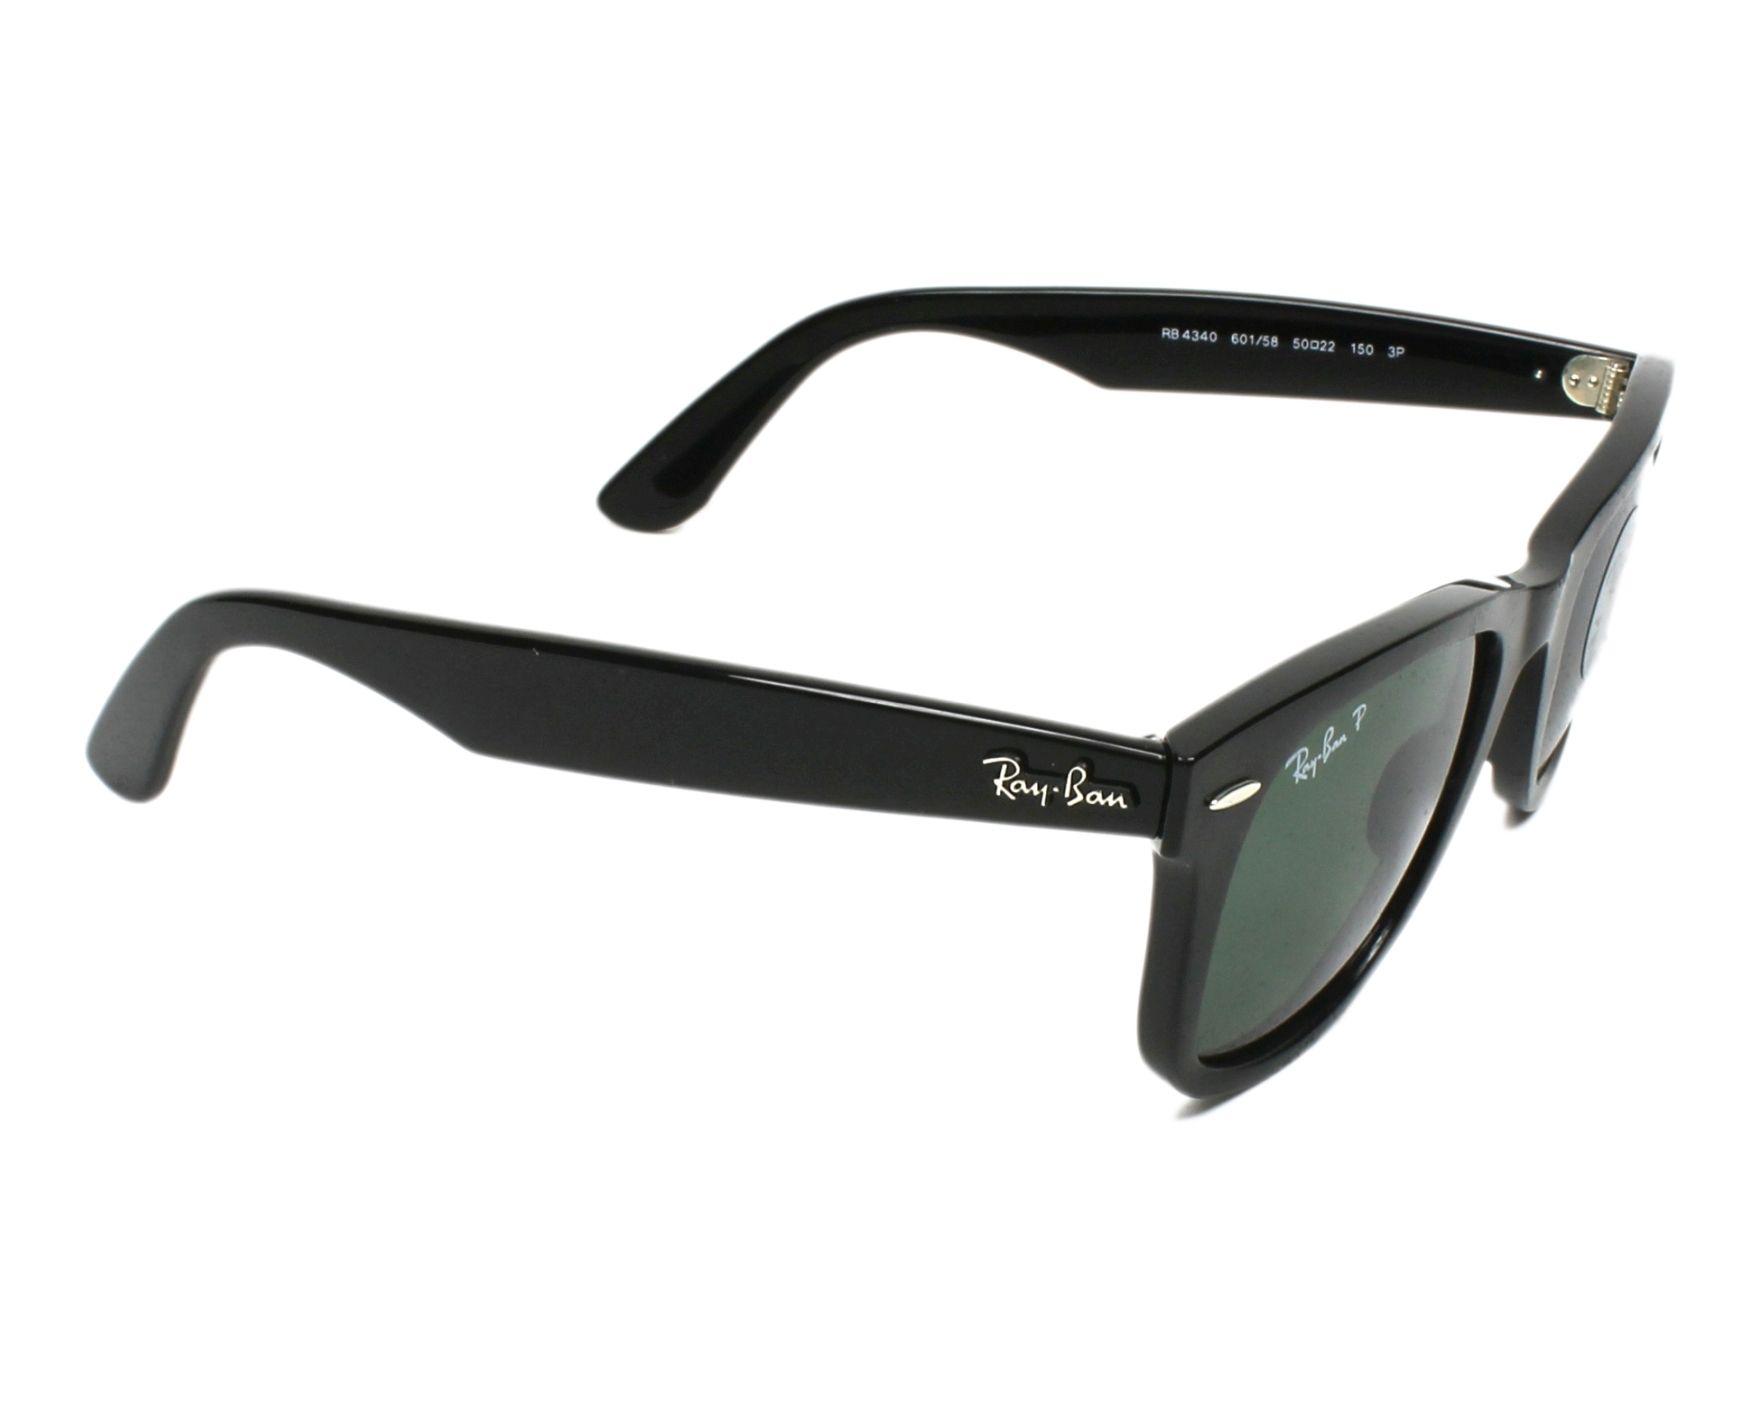 135400976e9 Sunglasses Ray-Ban RB-4340 601 58 50-22 Black side view